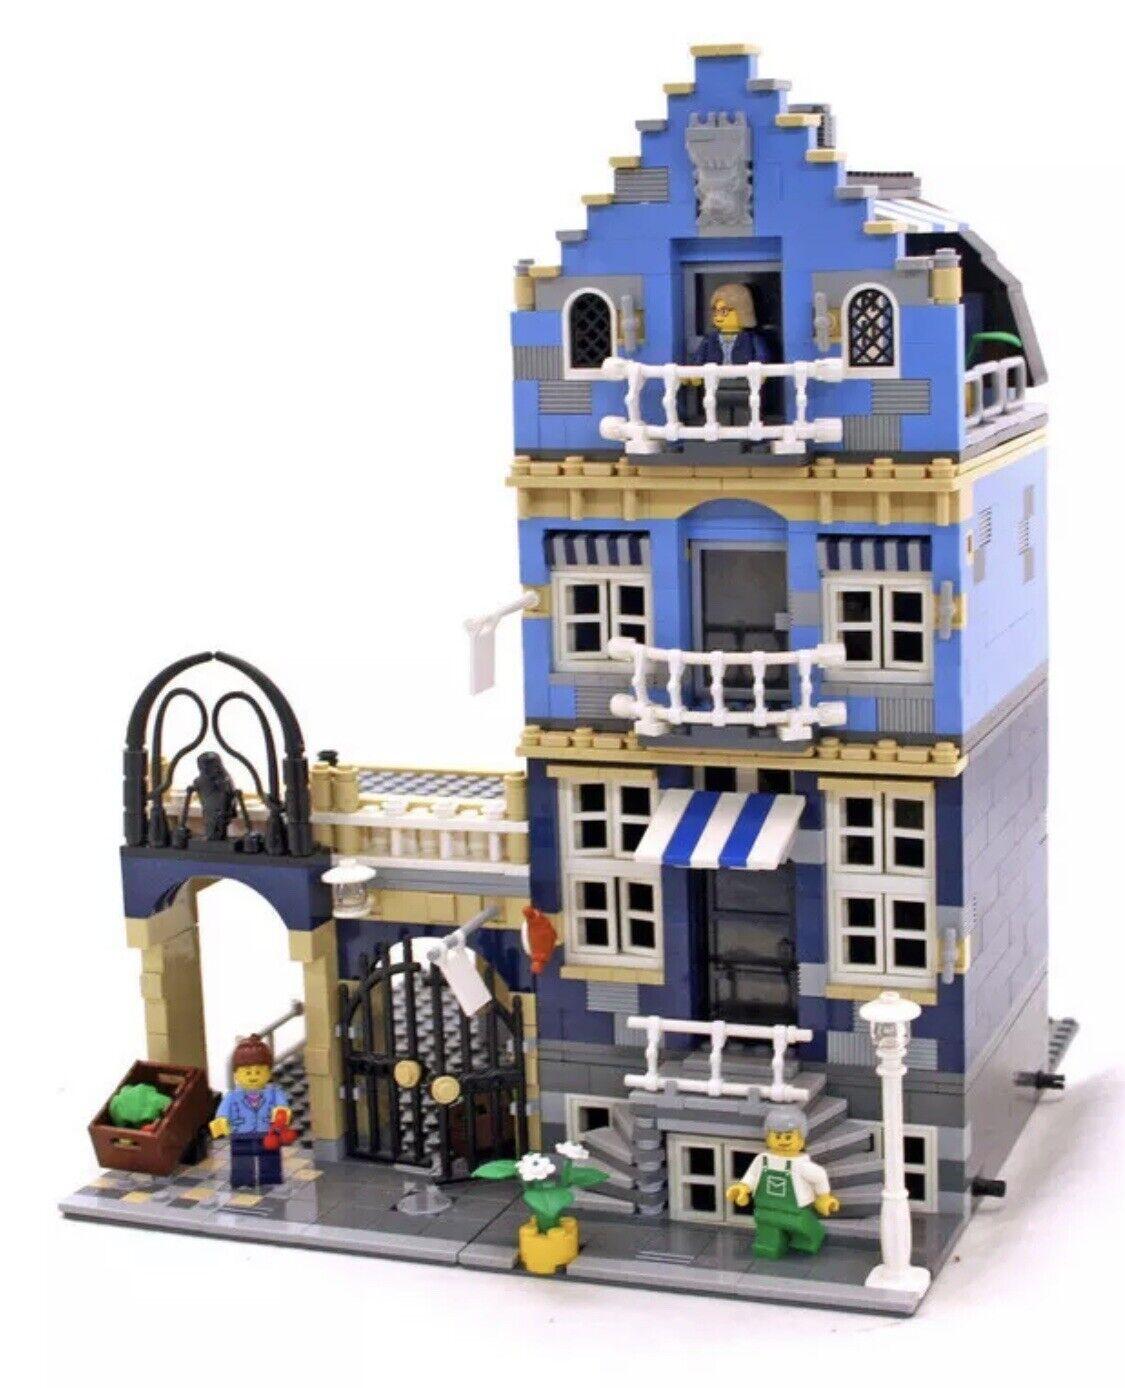 LEGO 10190 MARKET STREET 10190  MODULAR SERIES VHTF Complete w original Manual